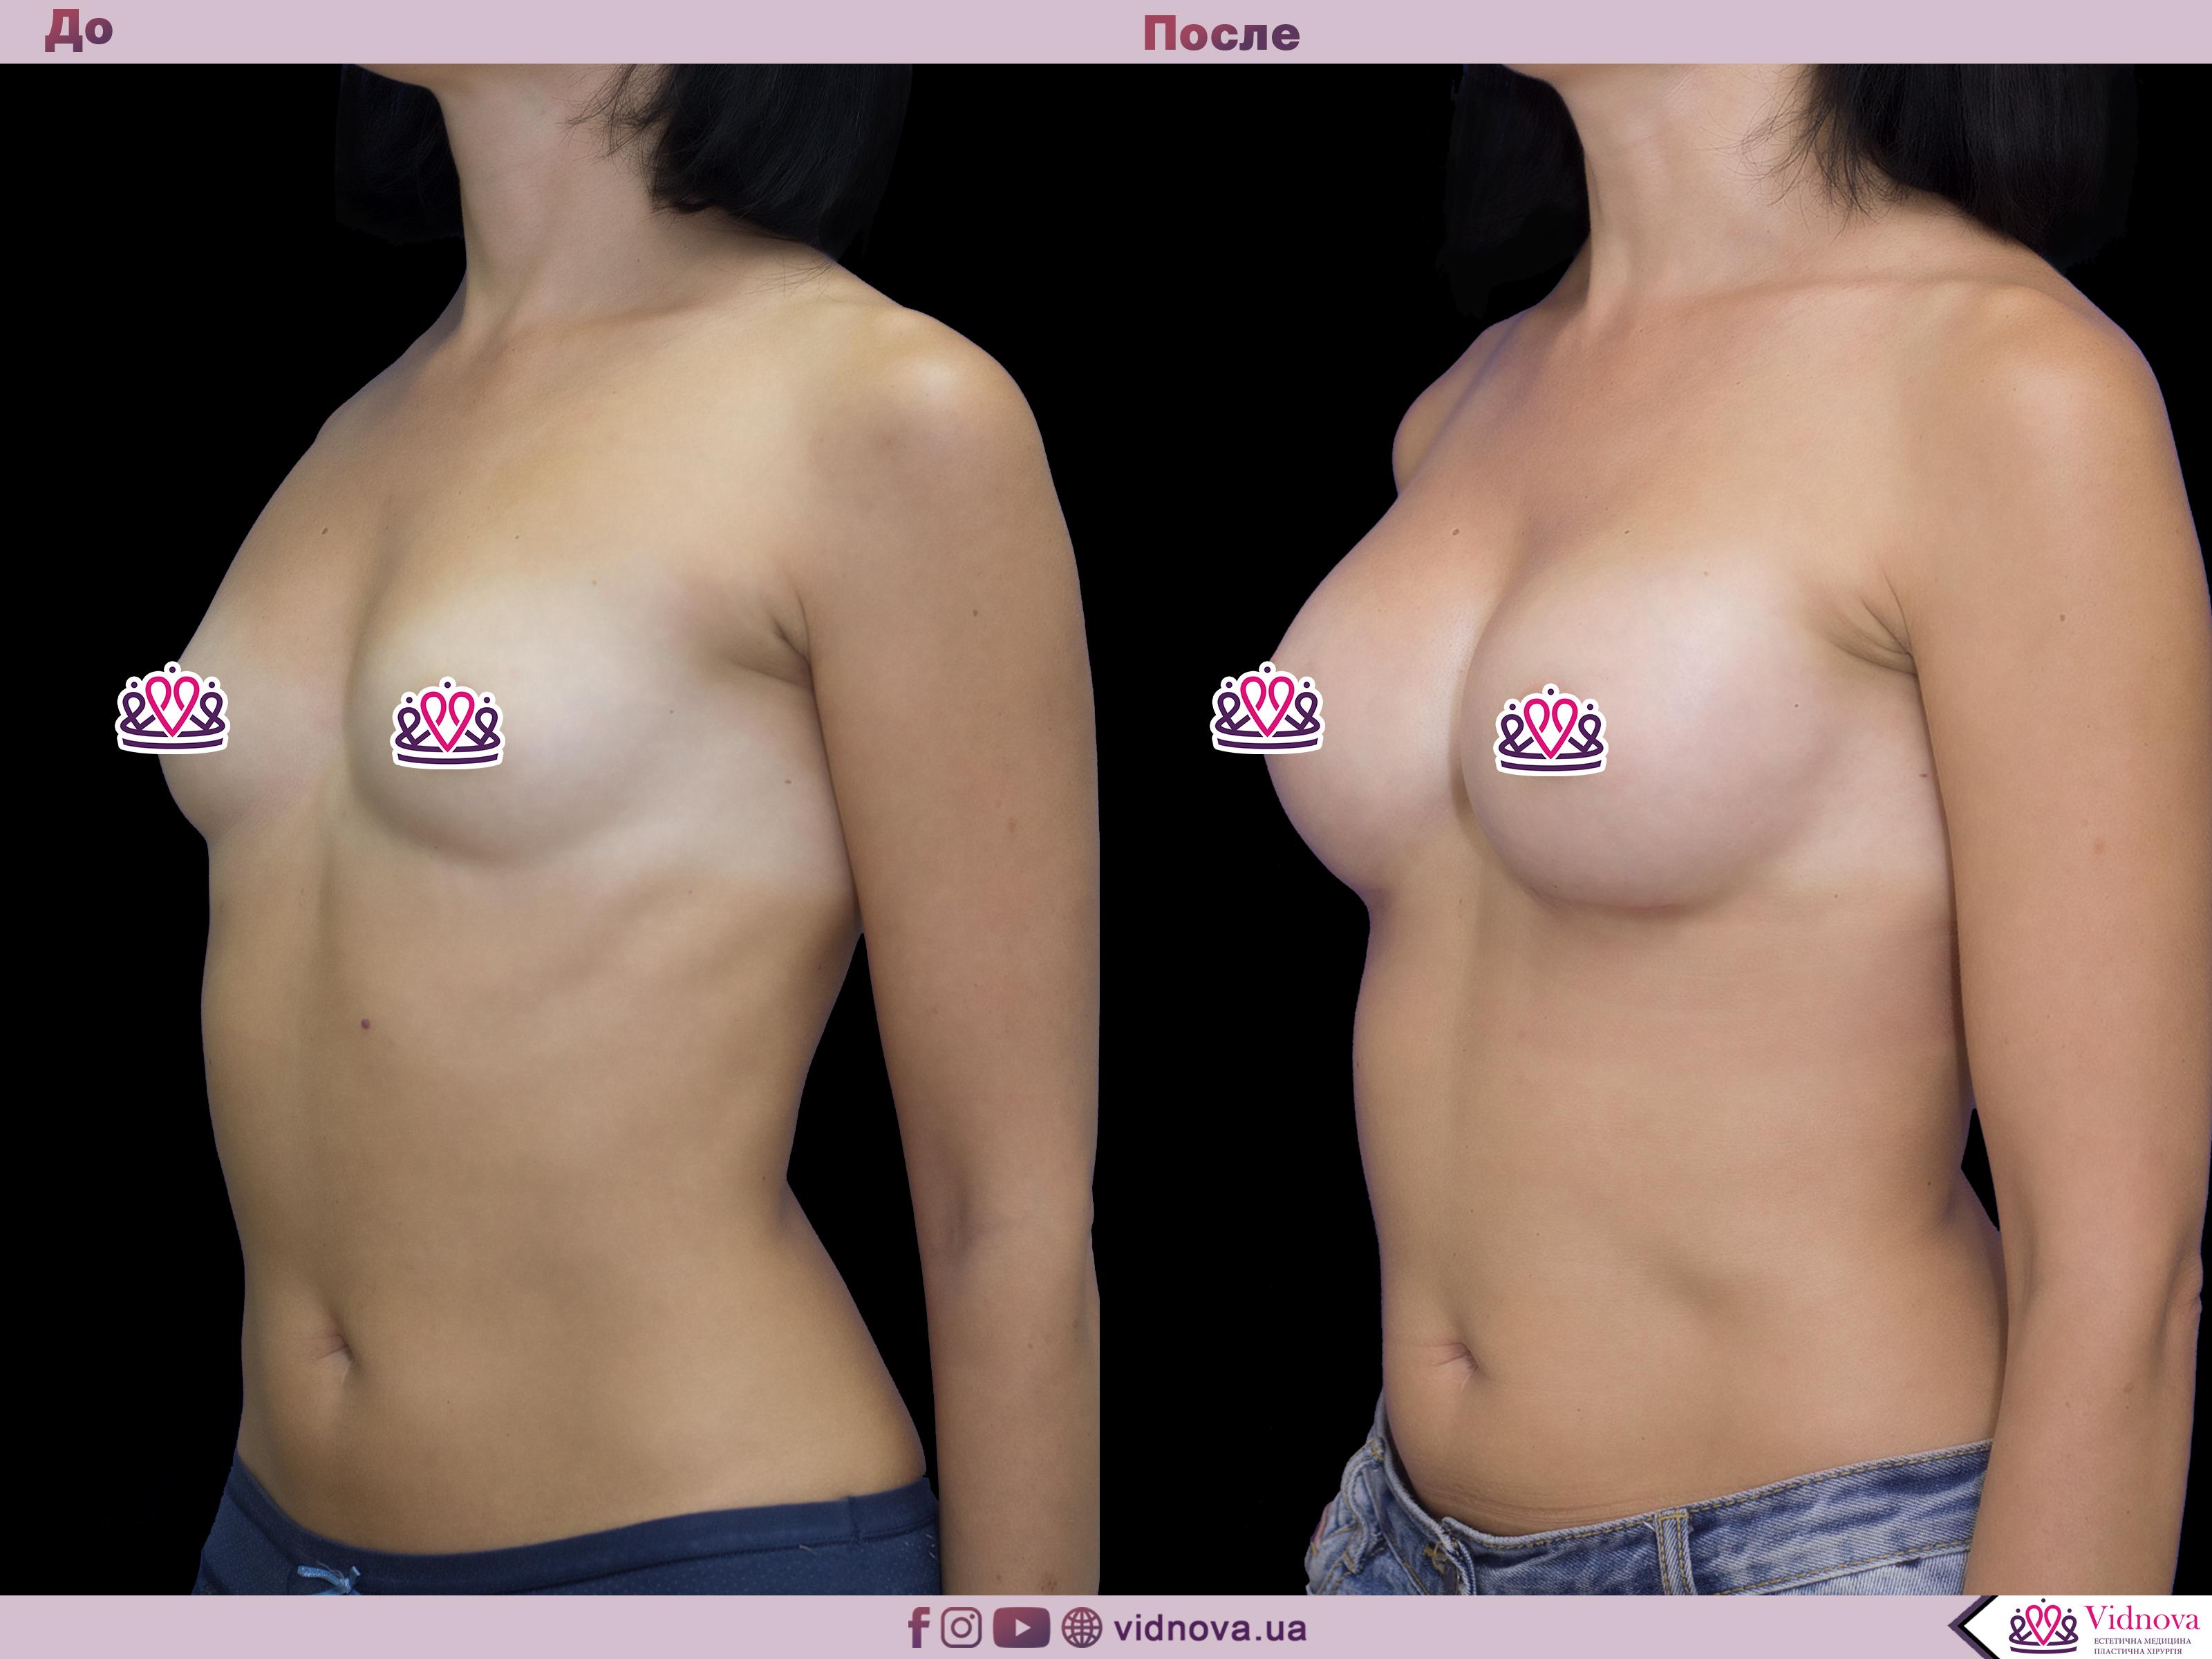 Увеличение груди: Фото ДО и ПОСЛЕ - Пример №48-2 - Клиника Vidnova